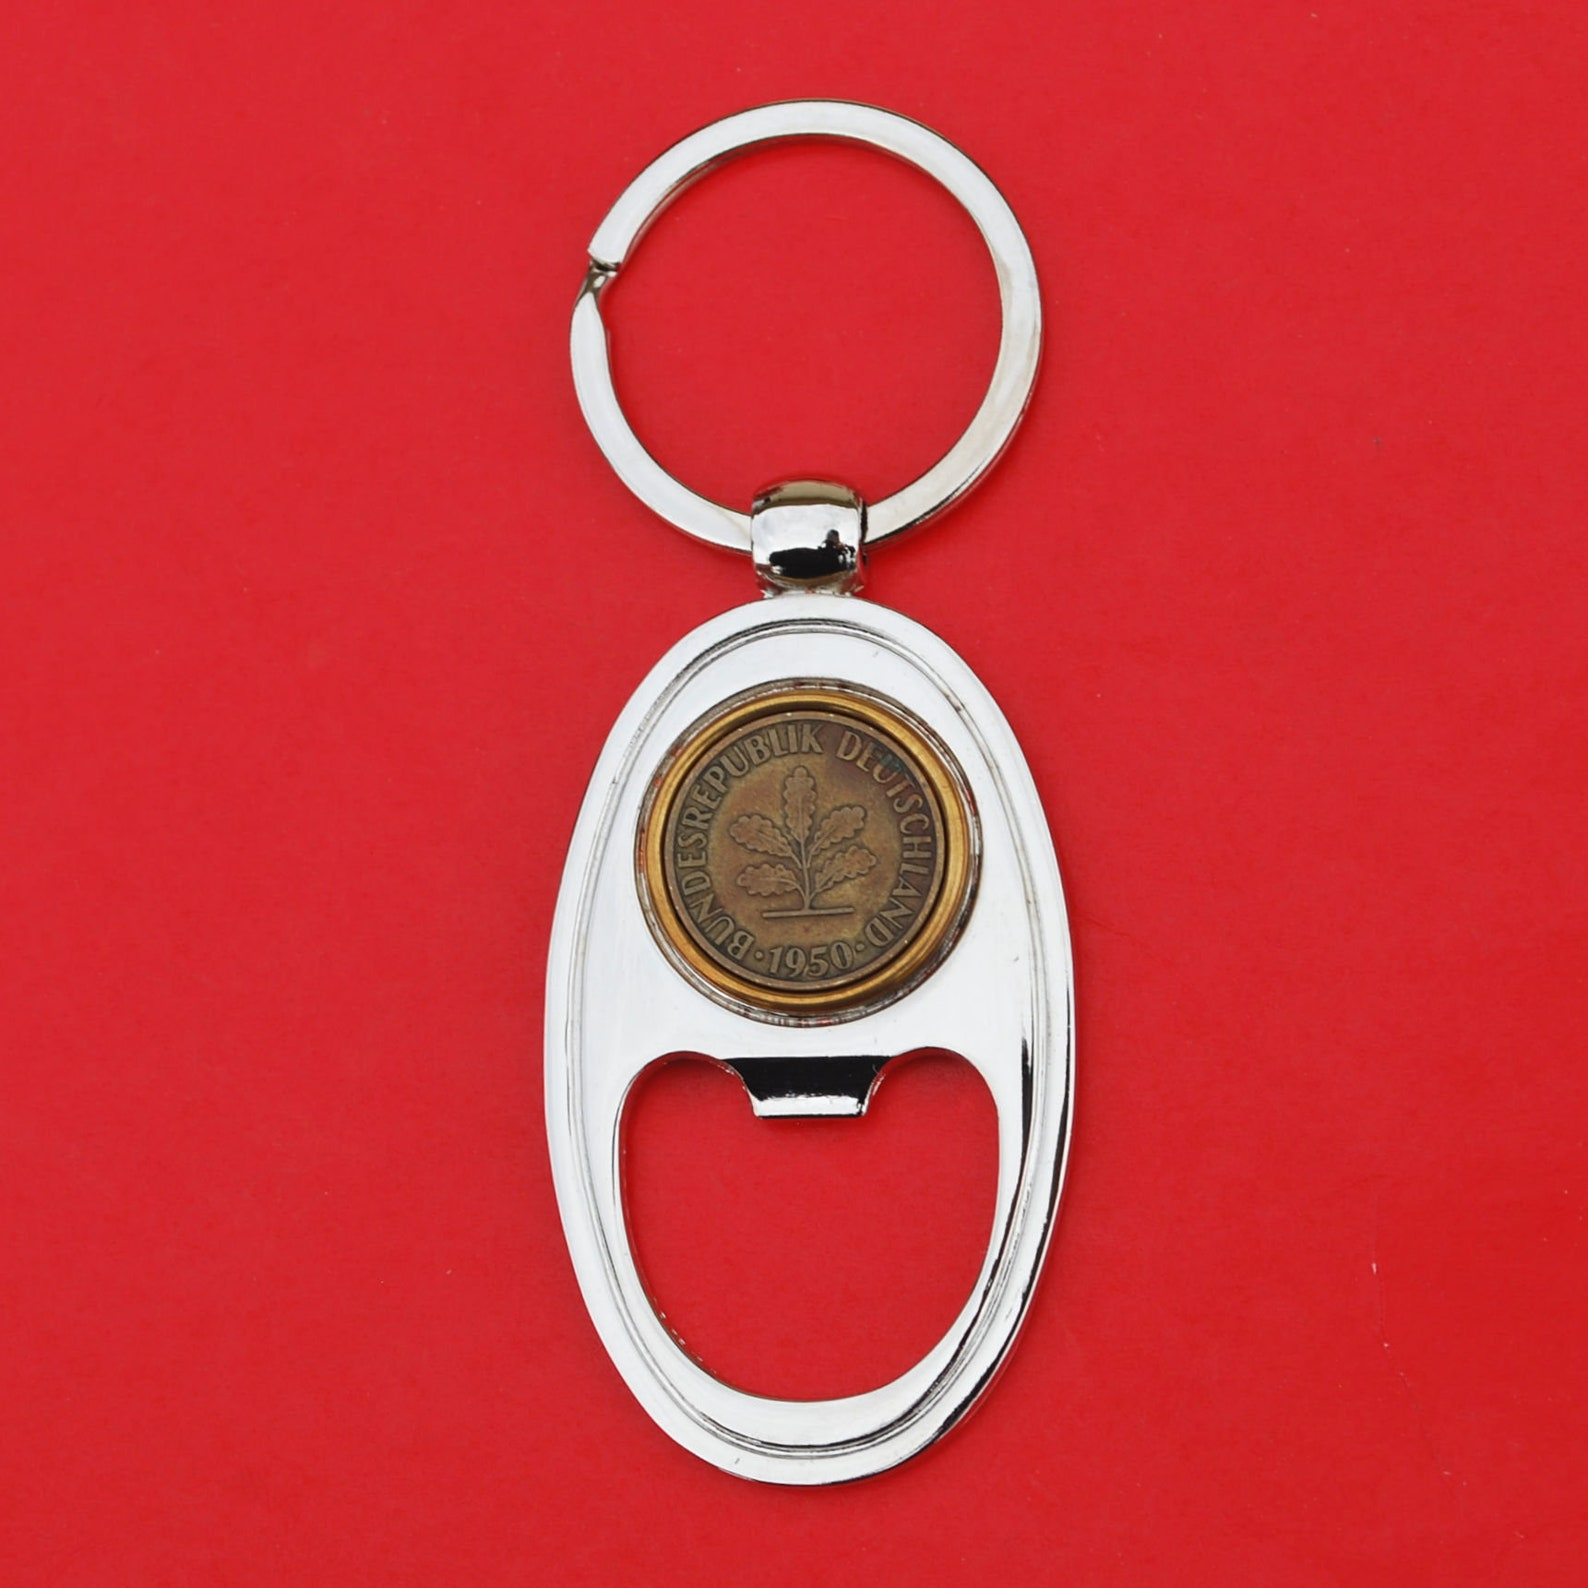 1950 Germany 5 Pfennig Coin Key Chain Ring Bottle Opener NEW - An Oak Seedling